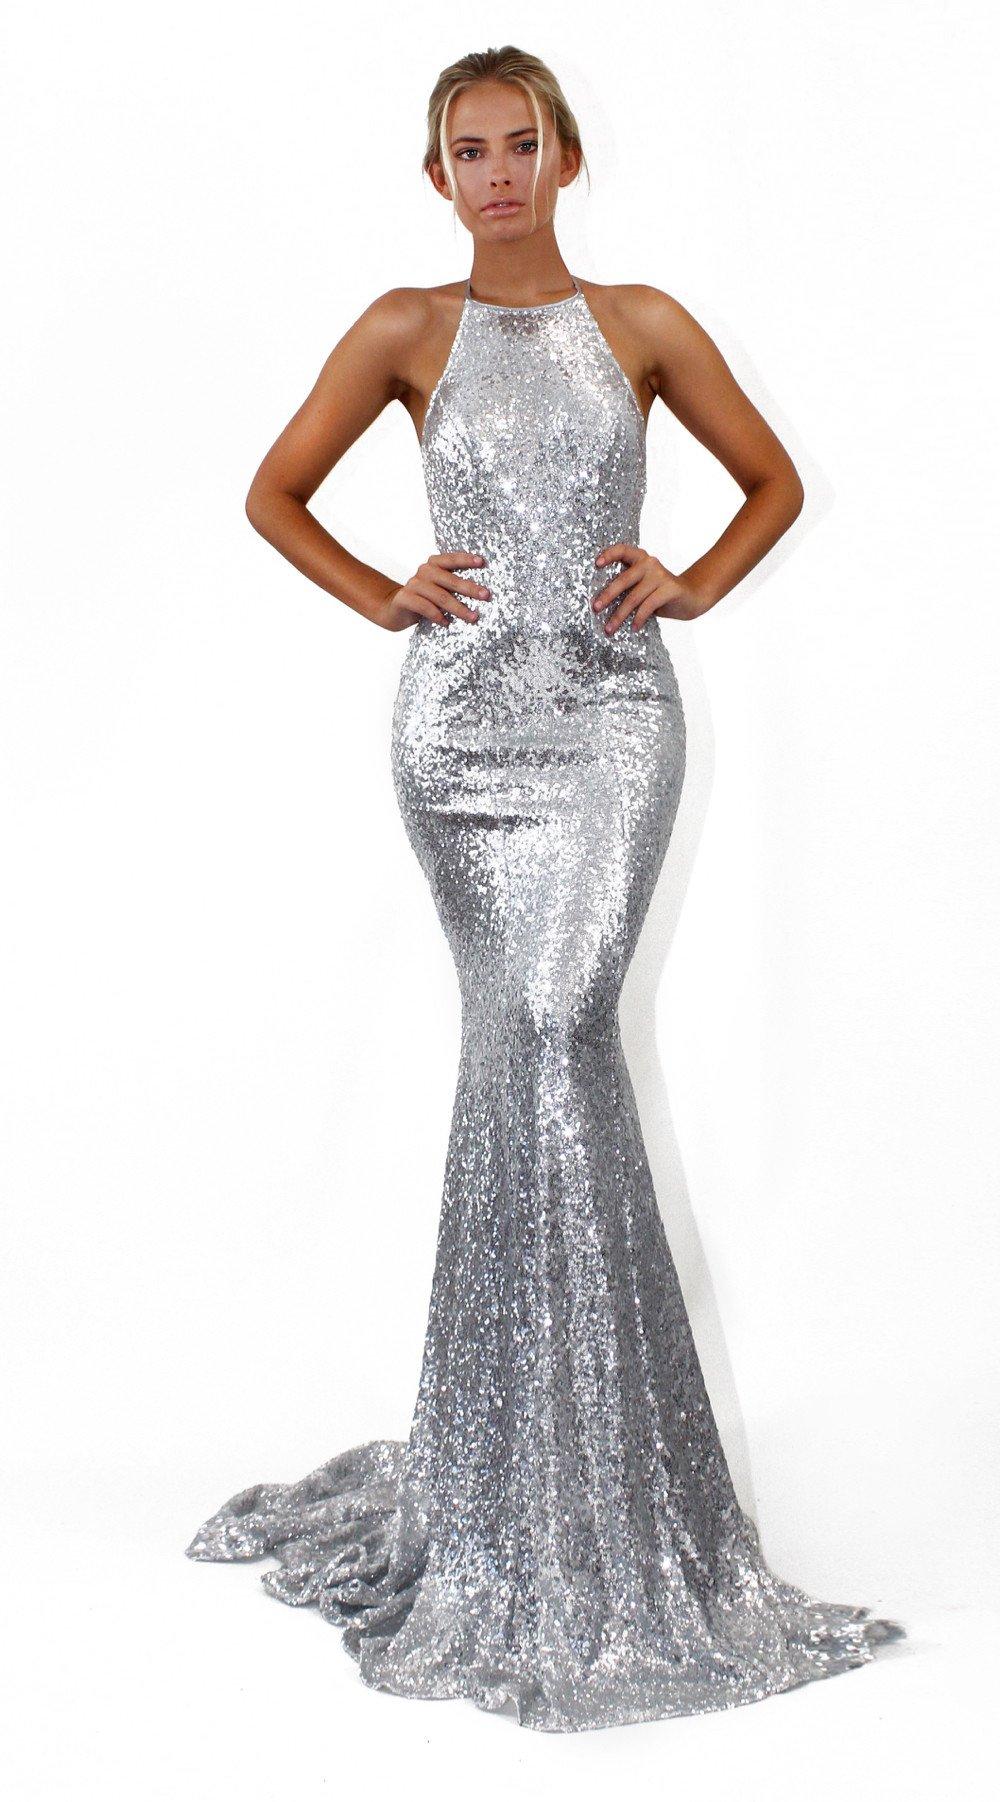 a483308c6127e Sexy Mermaid Prom Dress,Silver Prom Dress, Spaghetti Straps Long Prom  Dresses,Backless ...